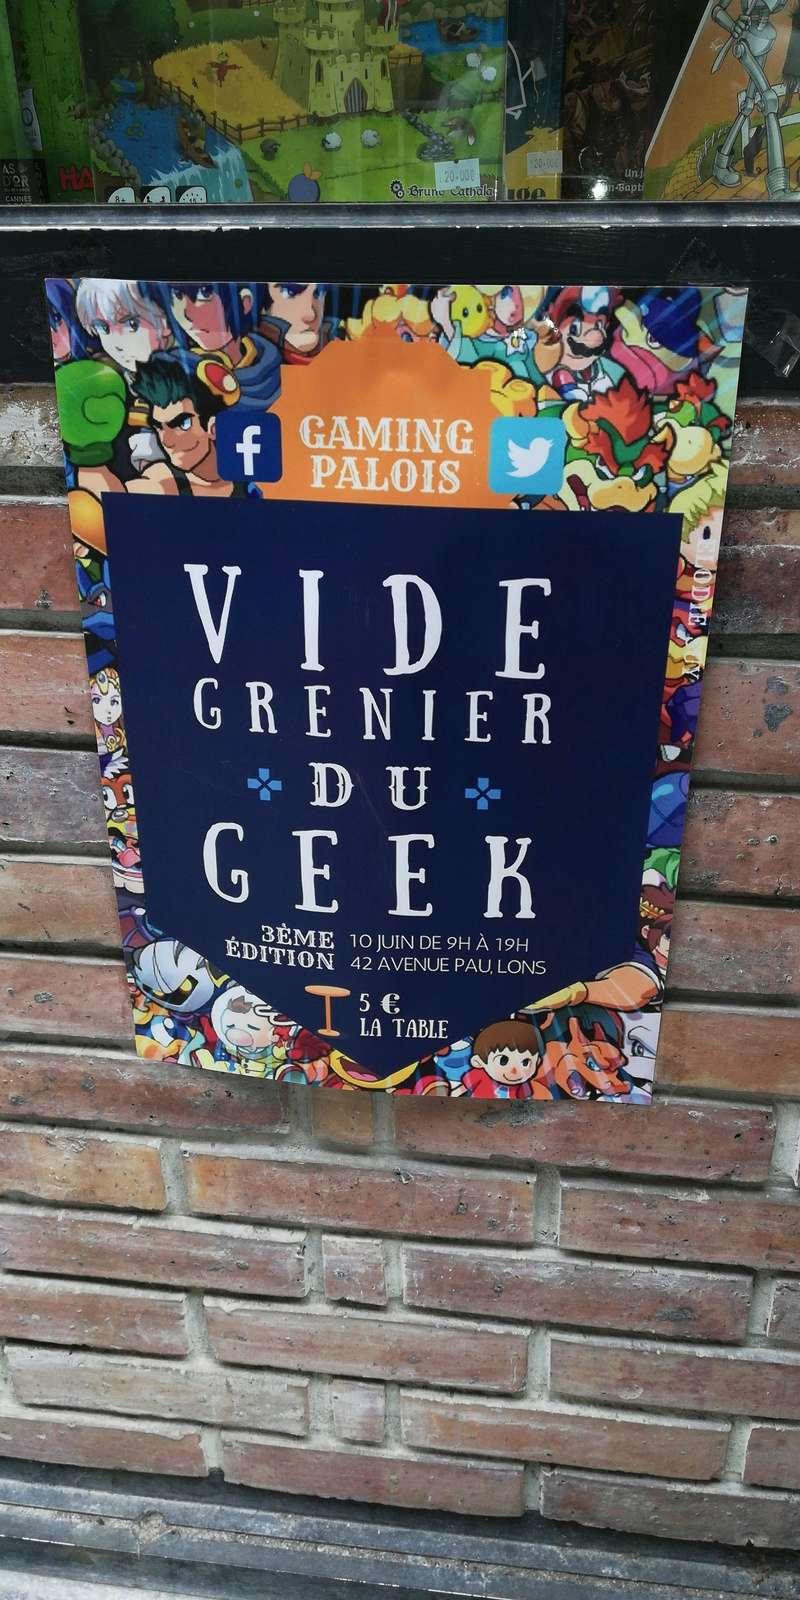 Vide grenier geek à lescar Img-2011